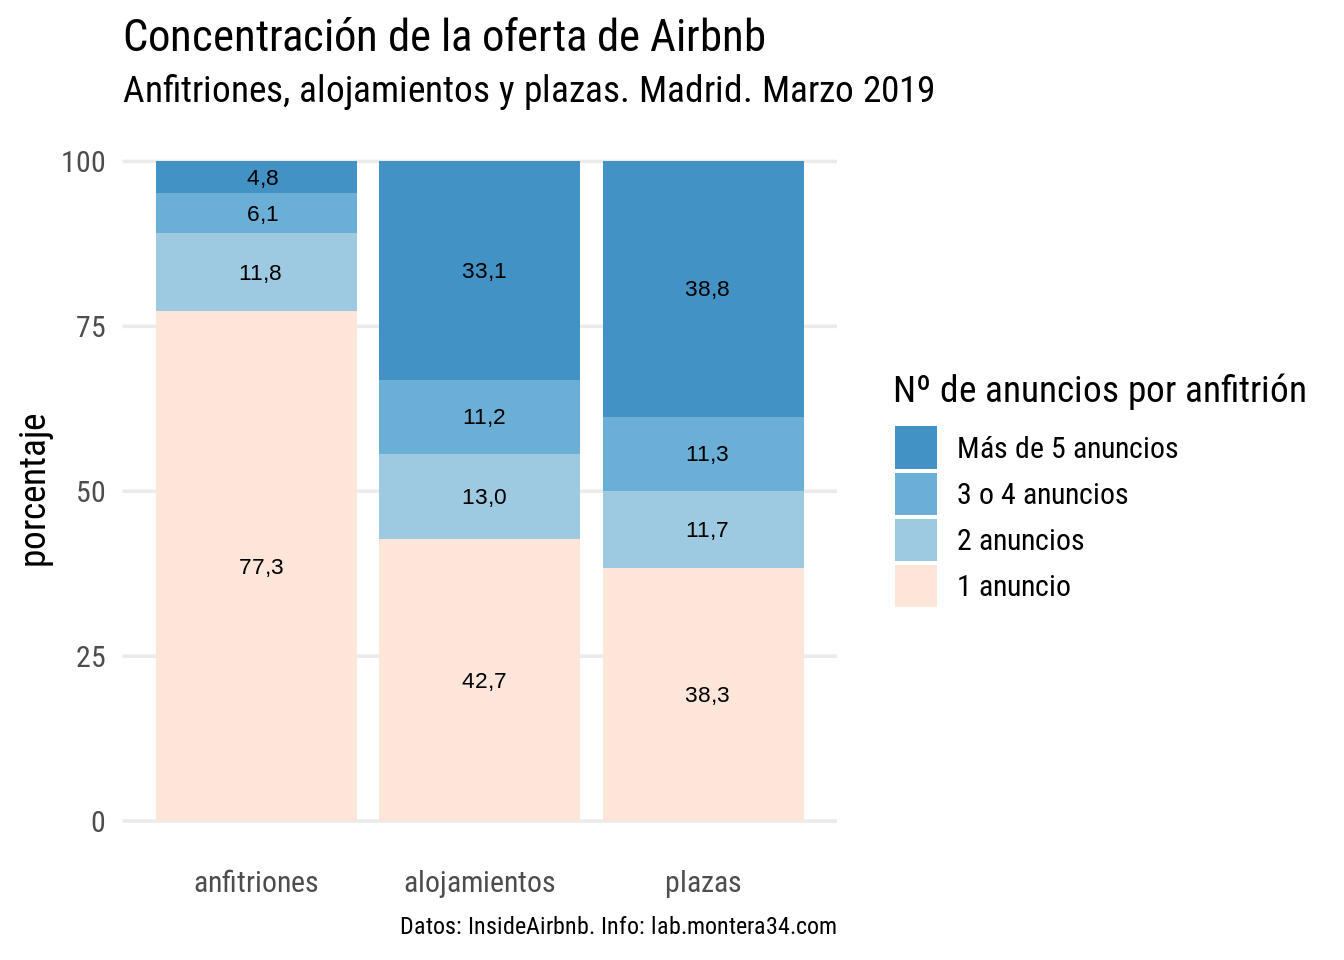 static/images/madrid/hosts/concentracion-oferta-porcentaje-airbnb-madrid-201903.png